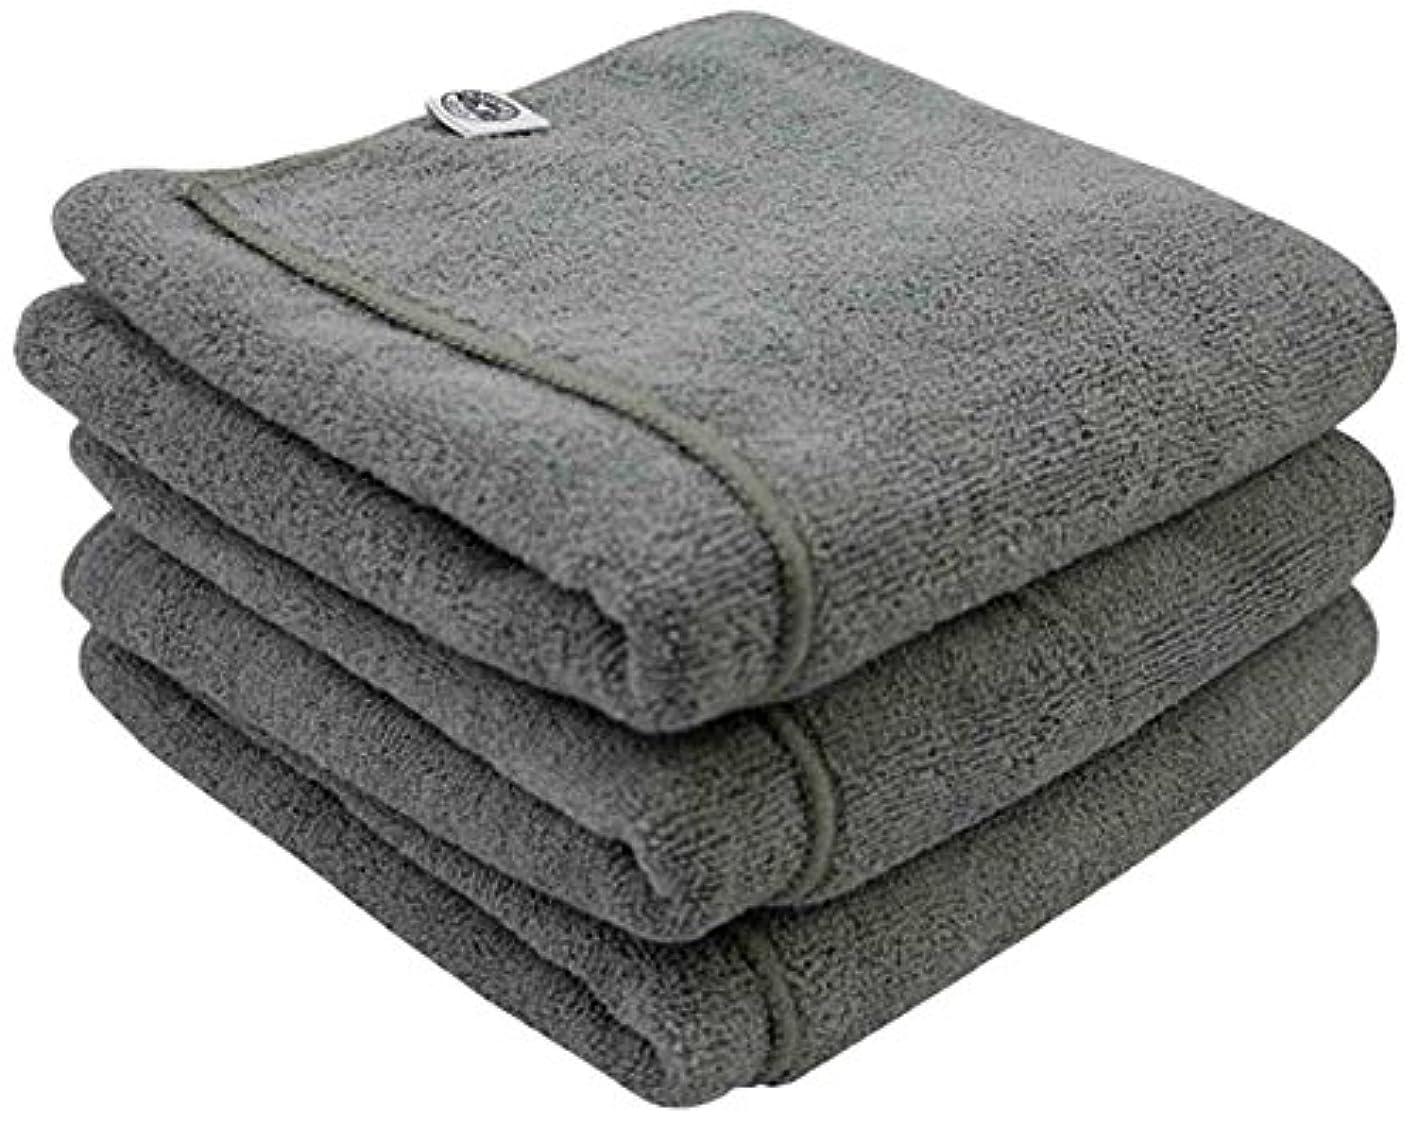 Chemical Guys MIC36006 Workhorse XL Gray Professional Grade Microfiber Towel, Metal (24 in. x 16 in.) (Pack of 6) mzmziophnem187